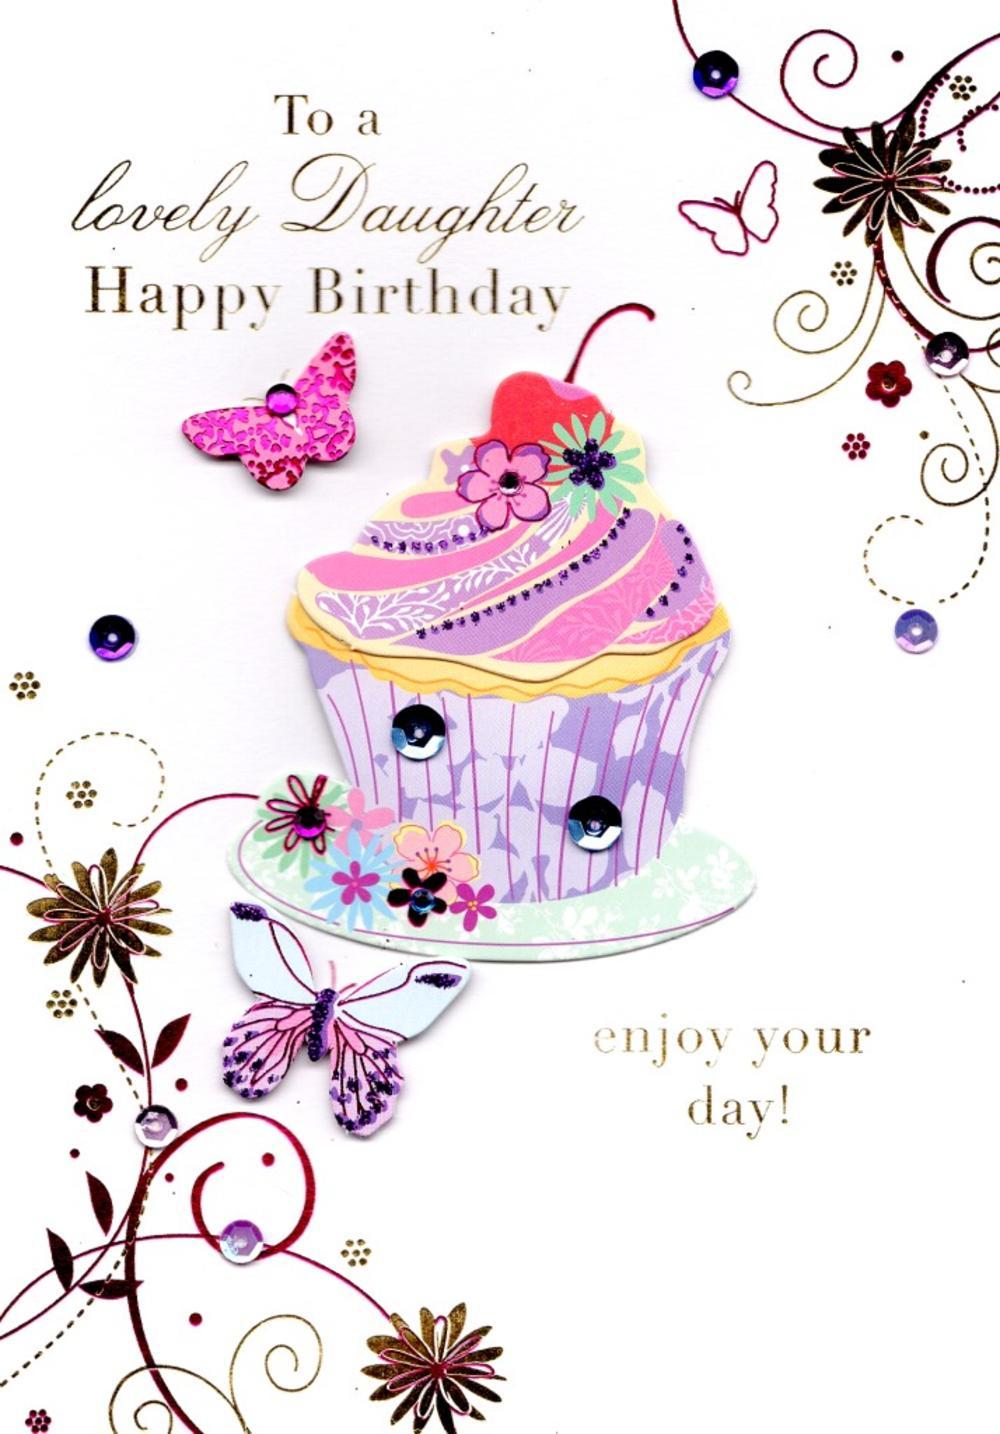 Lovely Daughter Handmade Birthday Greeting Card